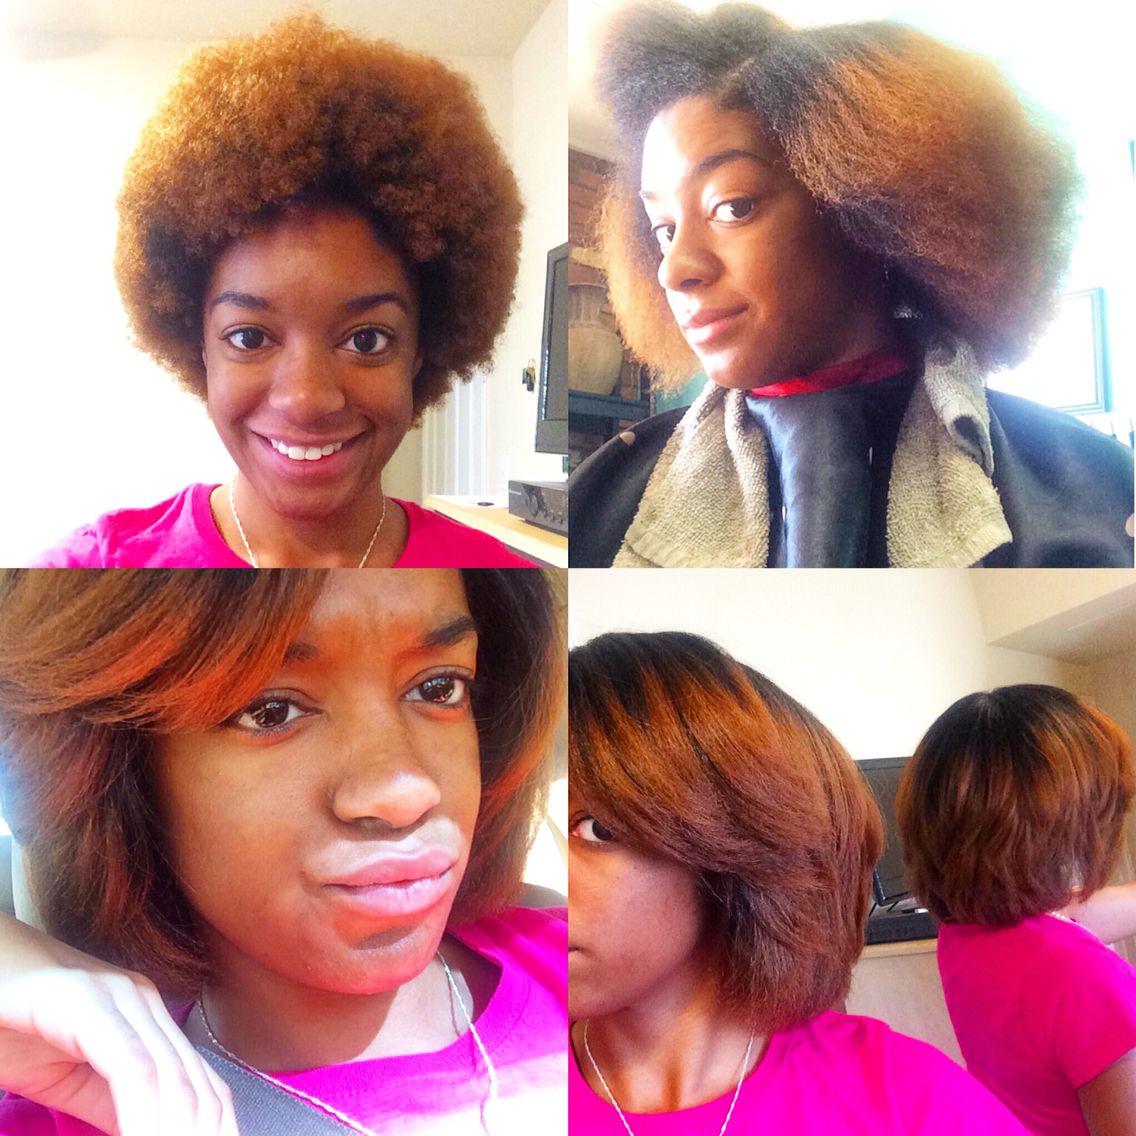 Natural Hair Colored Natural Hair 4c Hair 4b Hair Straight Natural Hair Hair Press Short Natural Hair Blowout Hair Natural Hair Styles Short Hair Styles